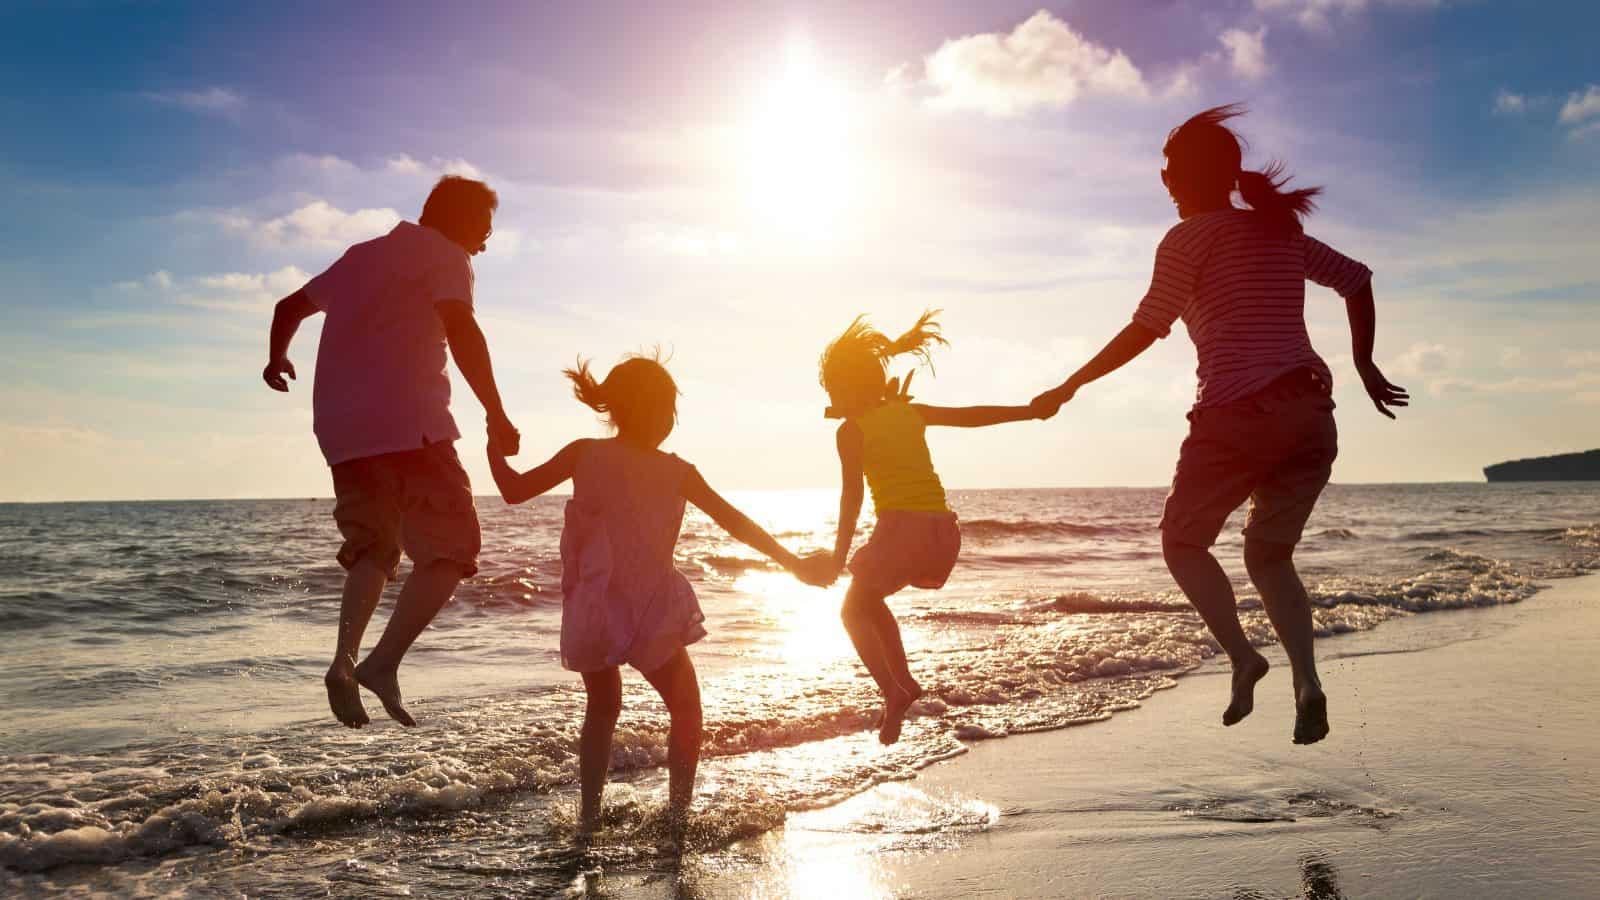 A family jumps as the waves crash on the beach.